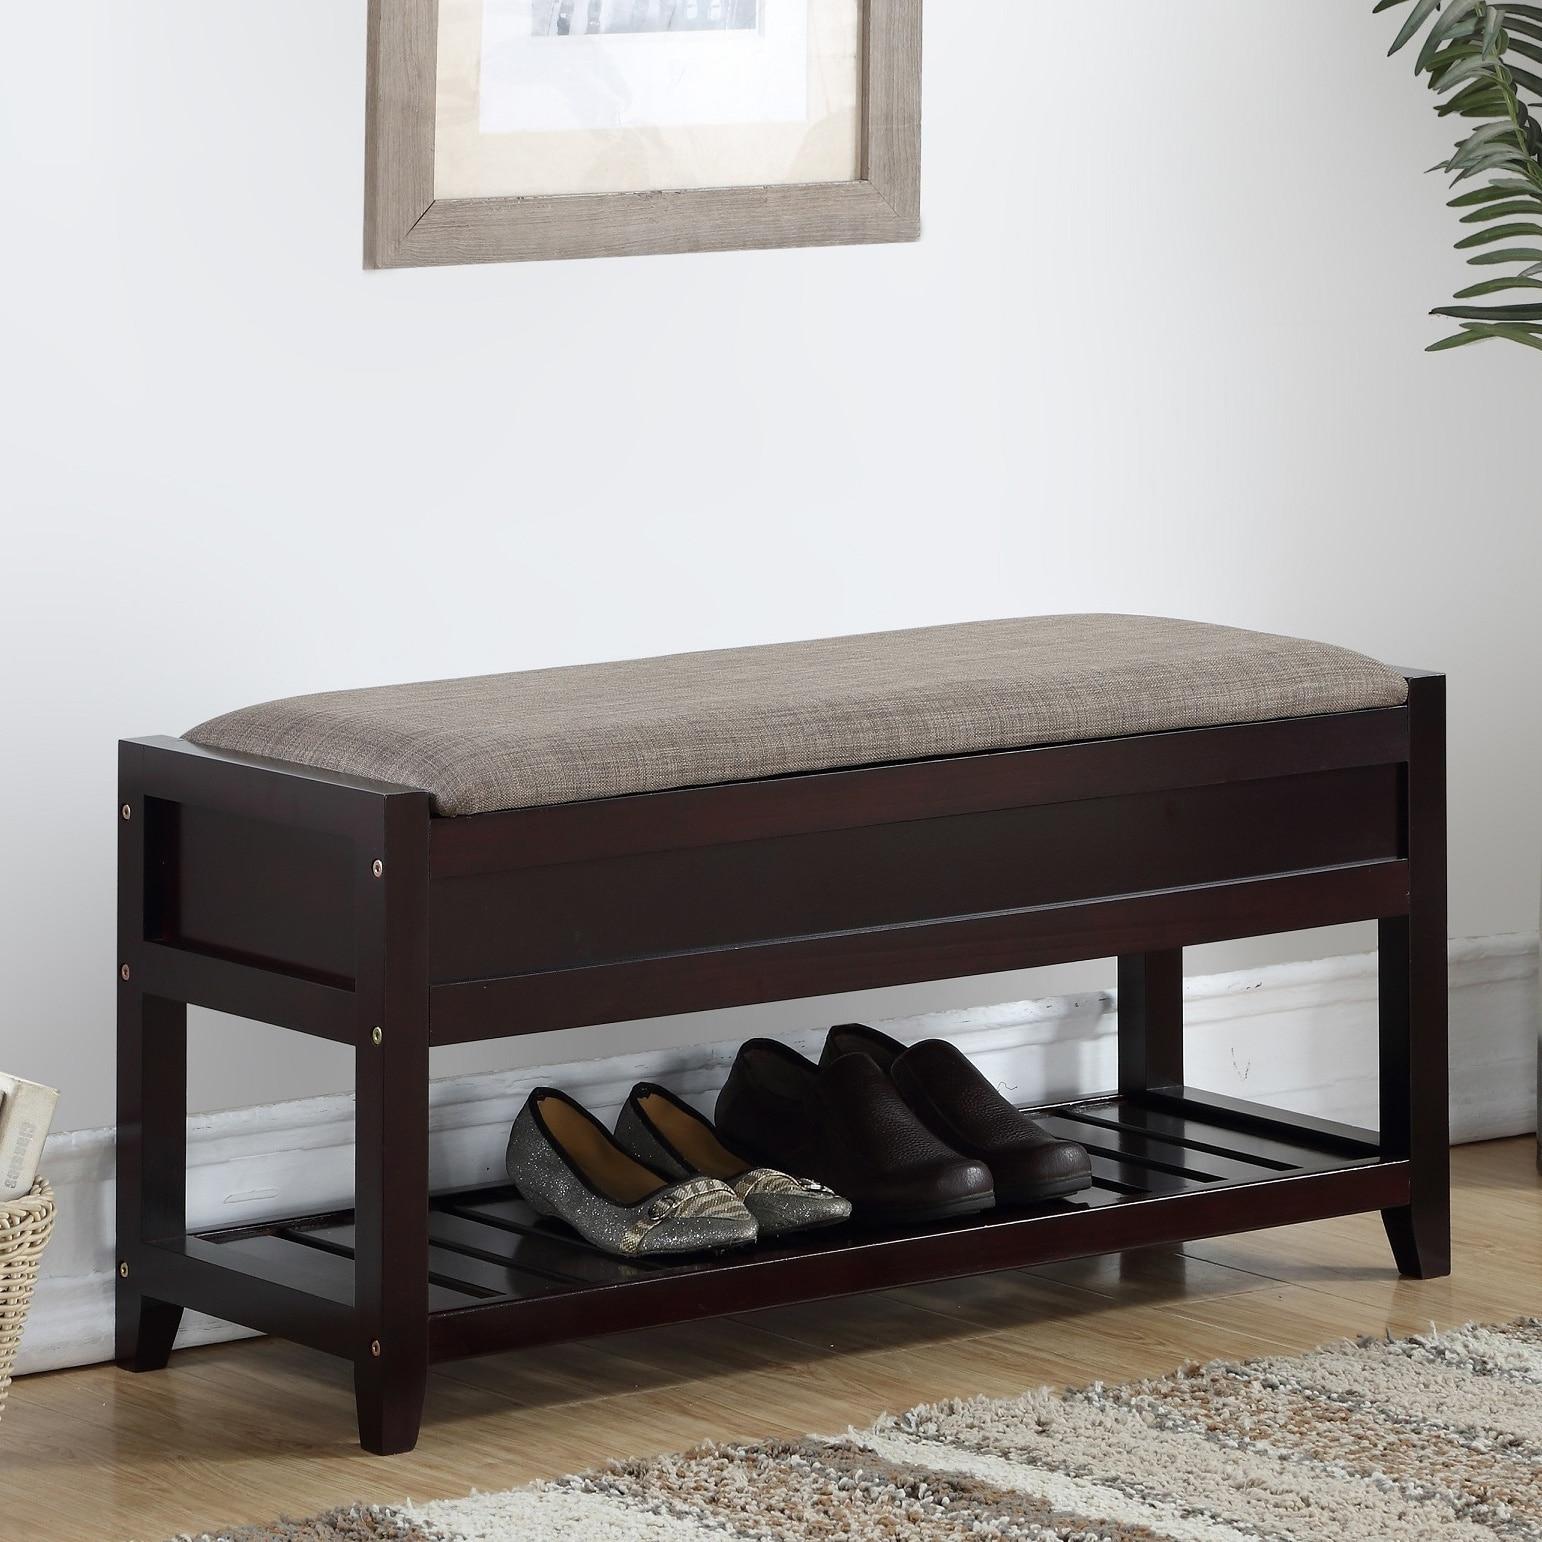 Miraculous Porch Den Humes Shoe Bench With Storage Machost Co Dining Chair Design Ideas Machostcouk